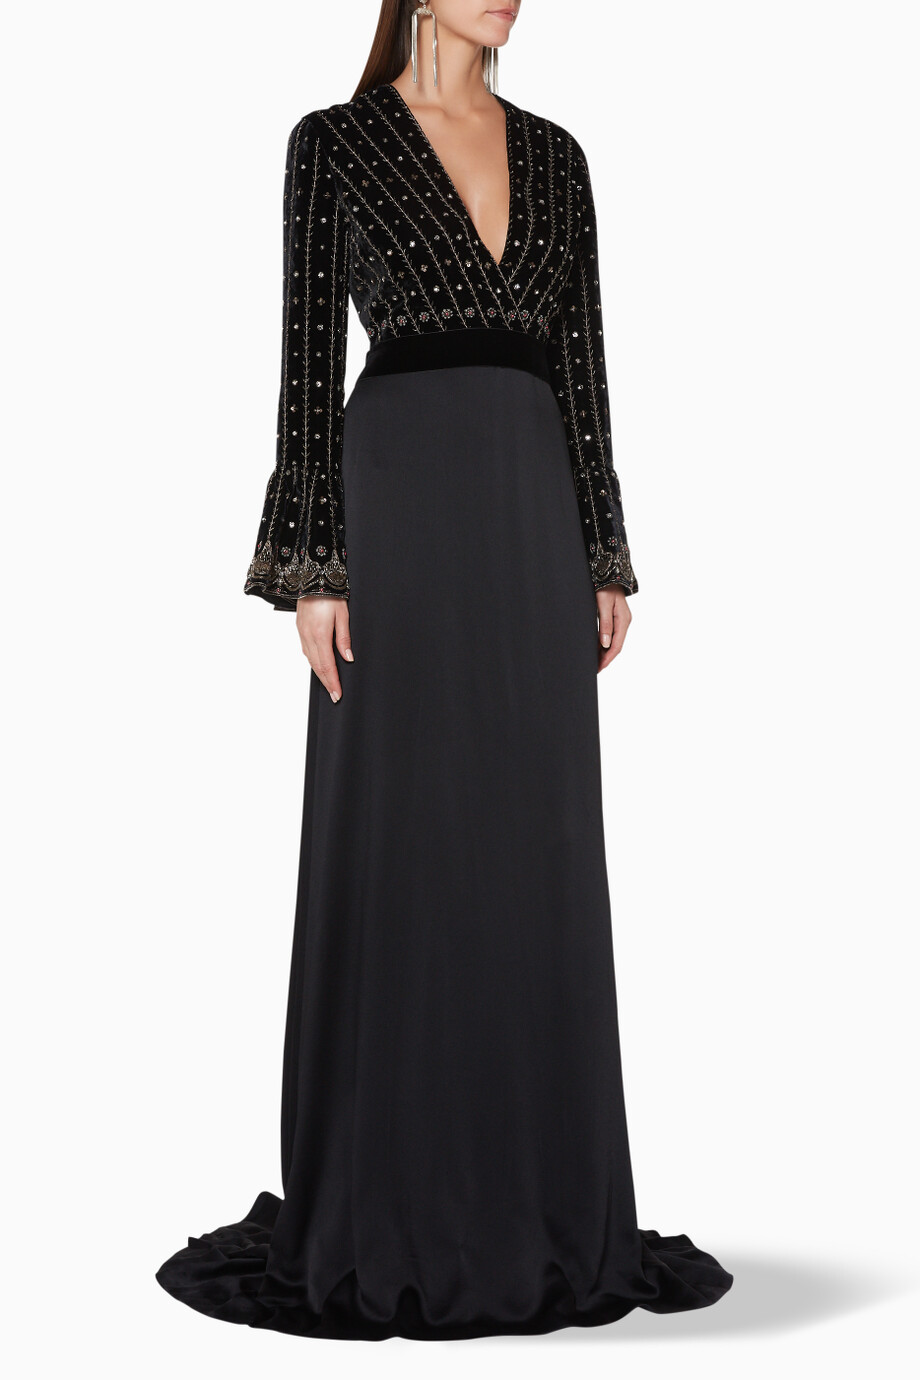 6944a3d5f8412 تسوق فستان سهرة بأكمام طويلة مطرز أسود Gucci أسود للنساء